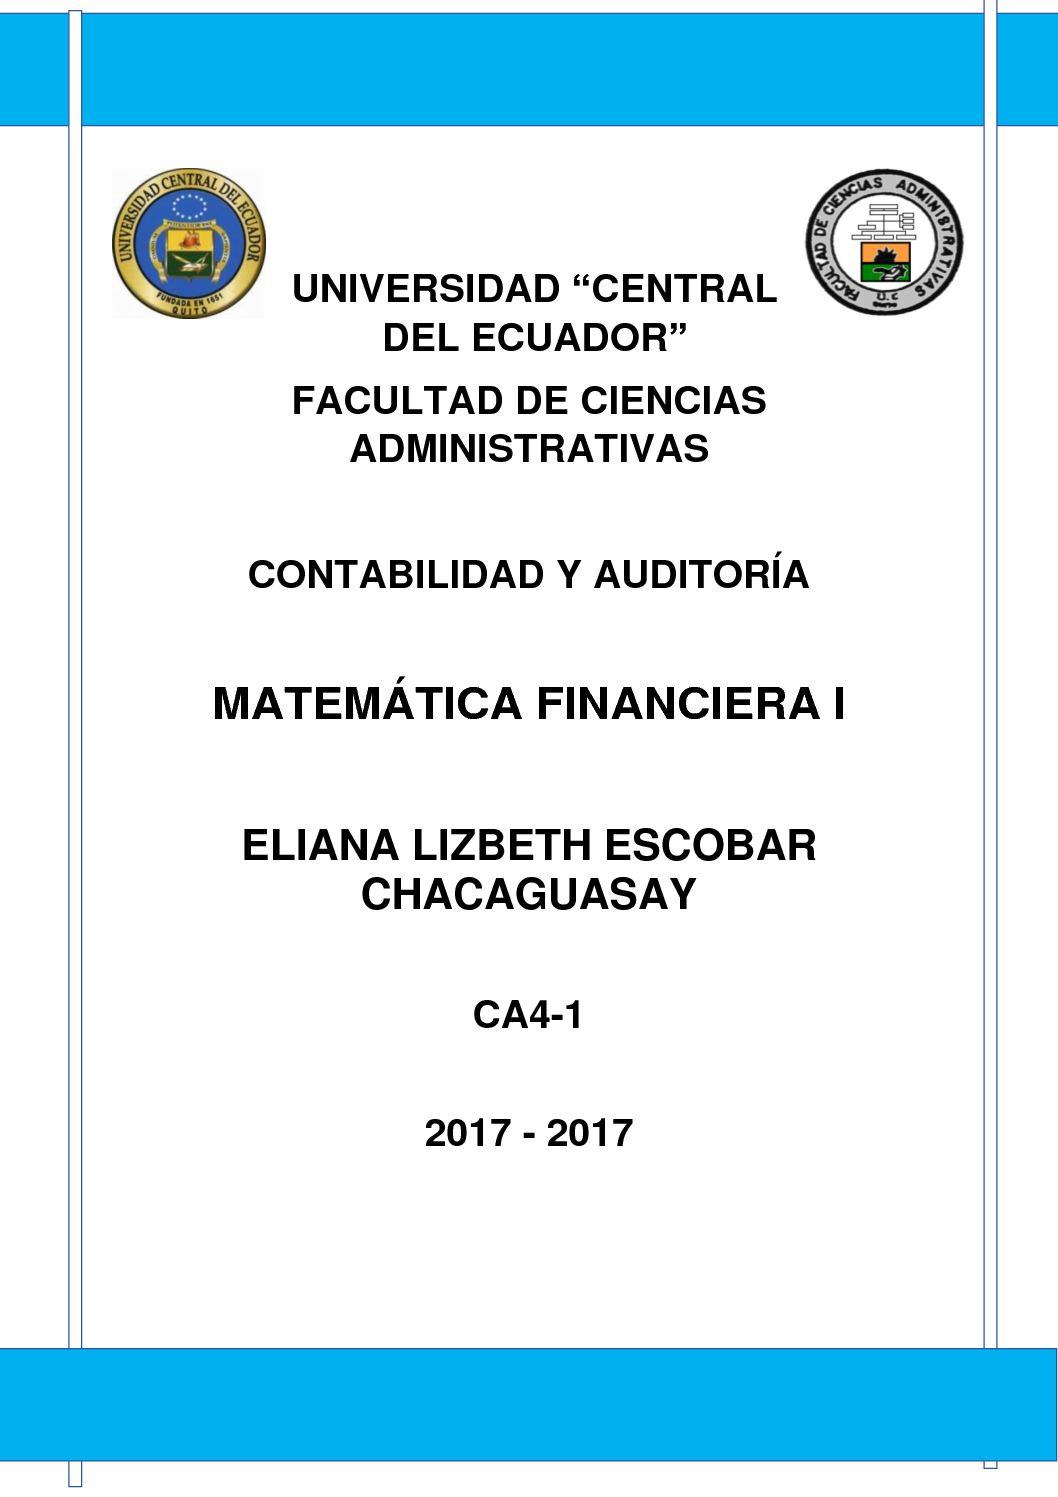 Calaméo Portafolio De Matematica Financiera I